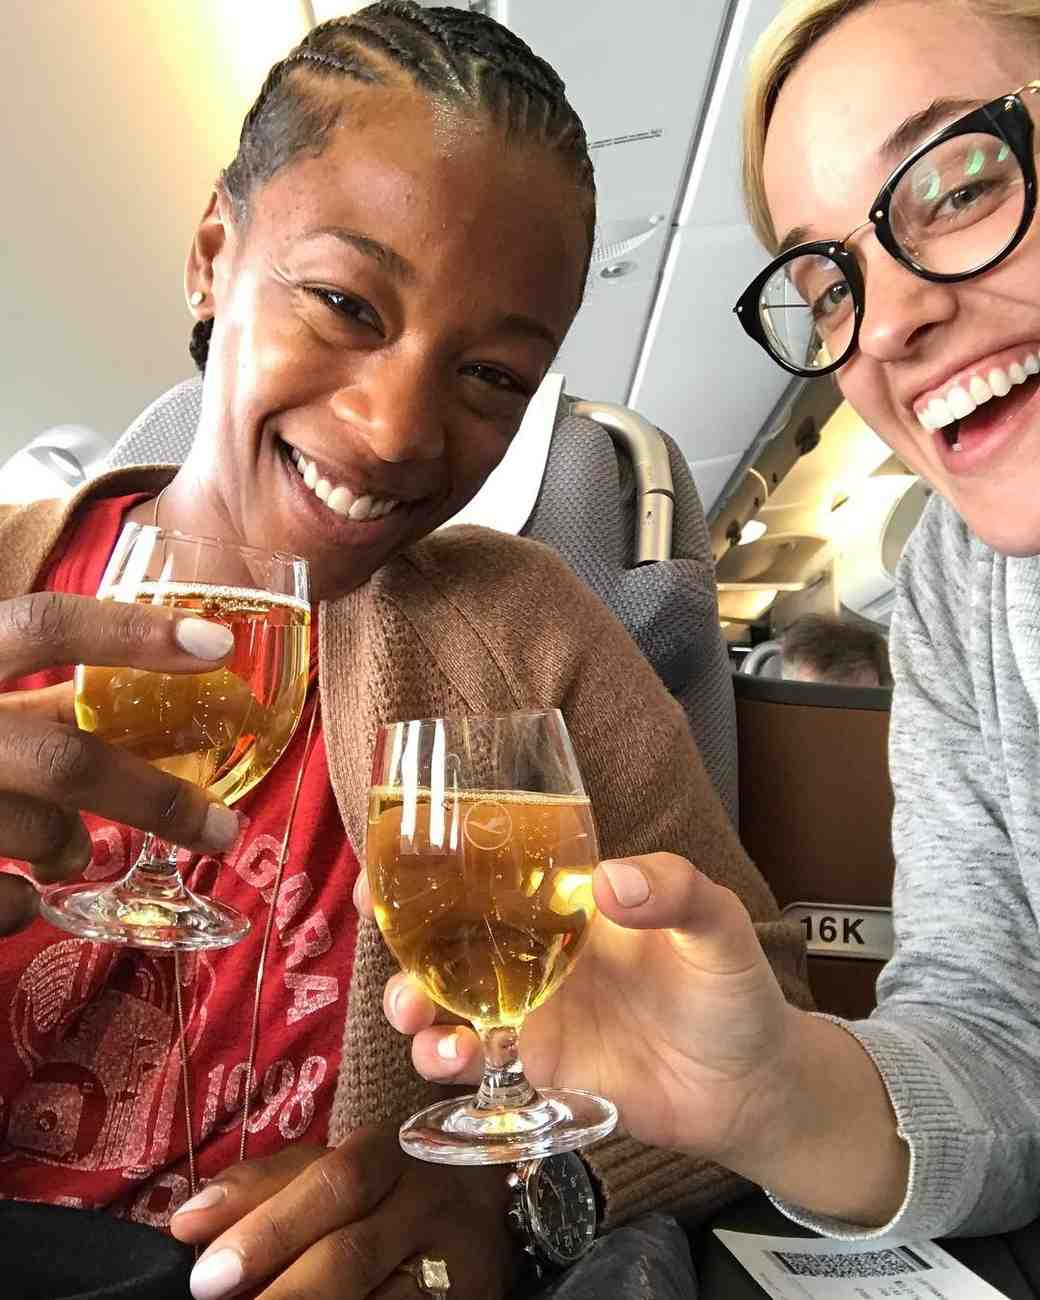 Lauren Morelli and Samira Wiley on a Plane